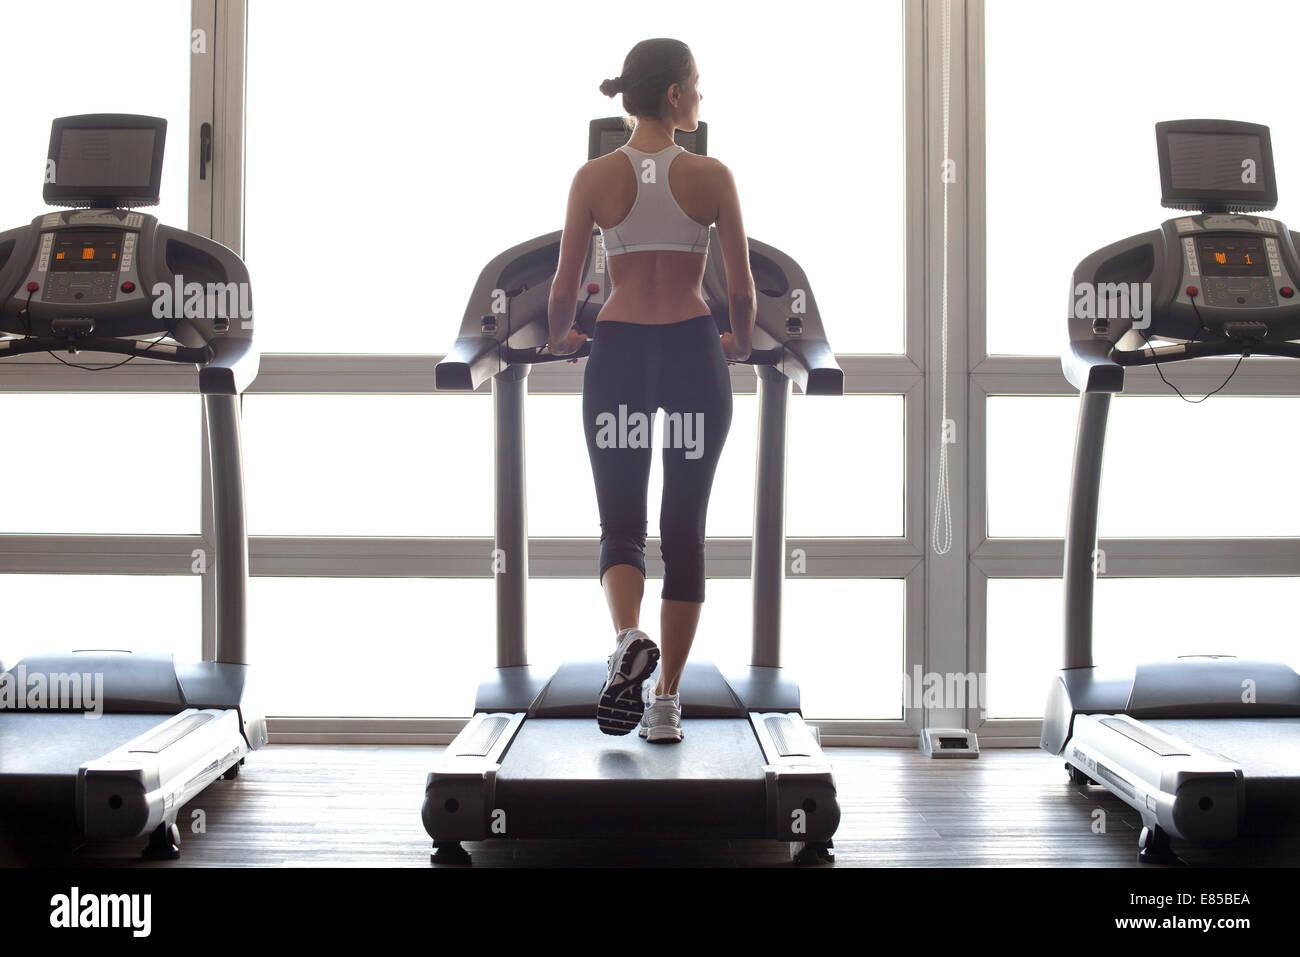 Joggen auf dem Laufband im Fitnessstudio Frau Stockbild